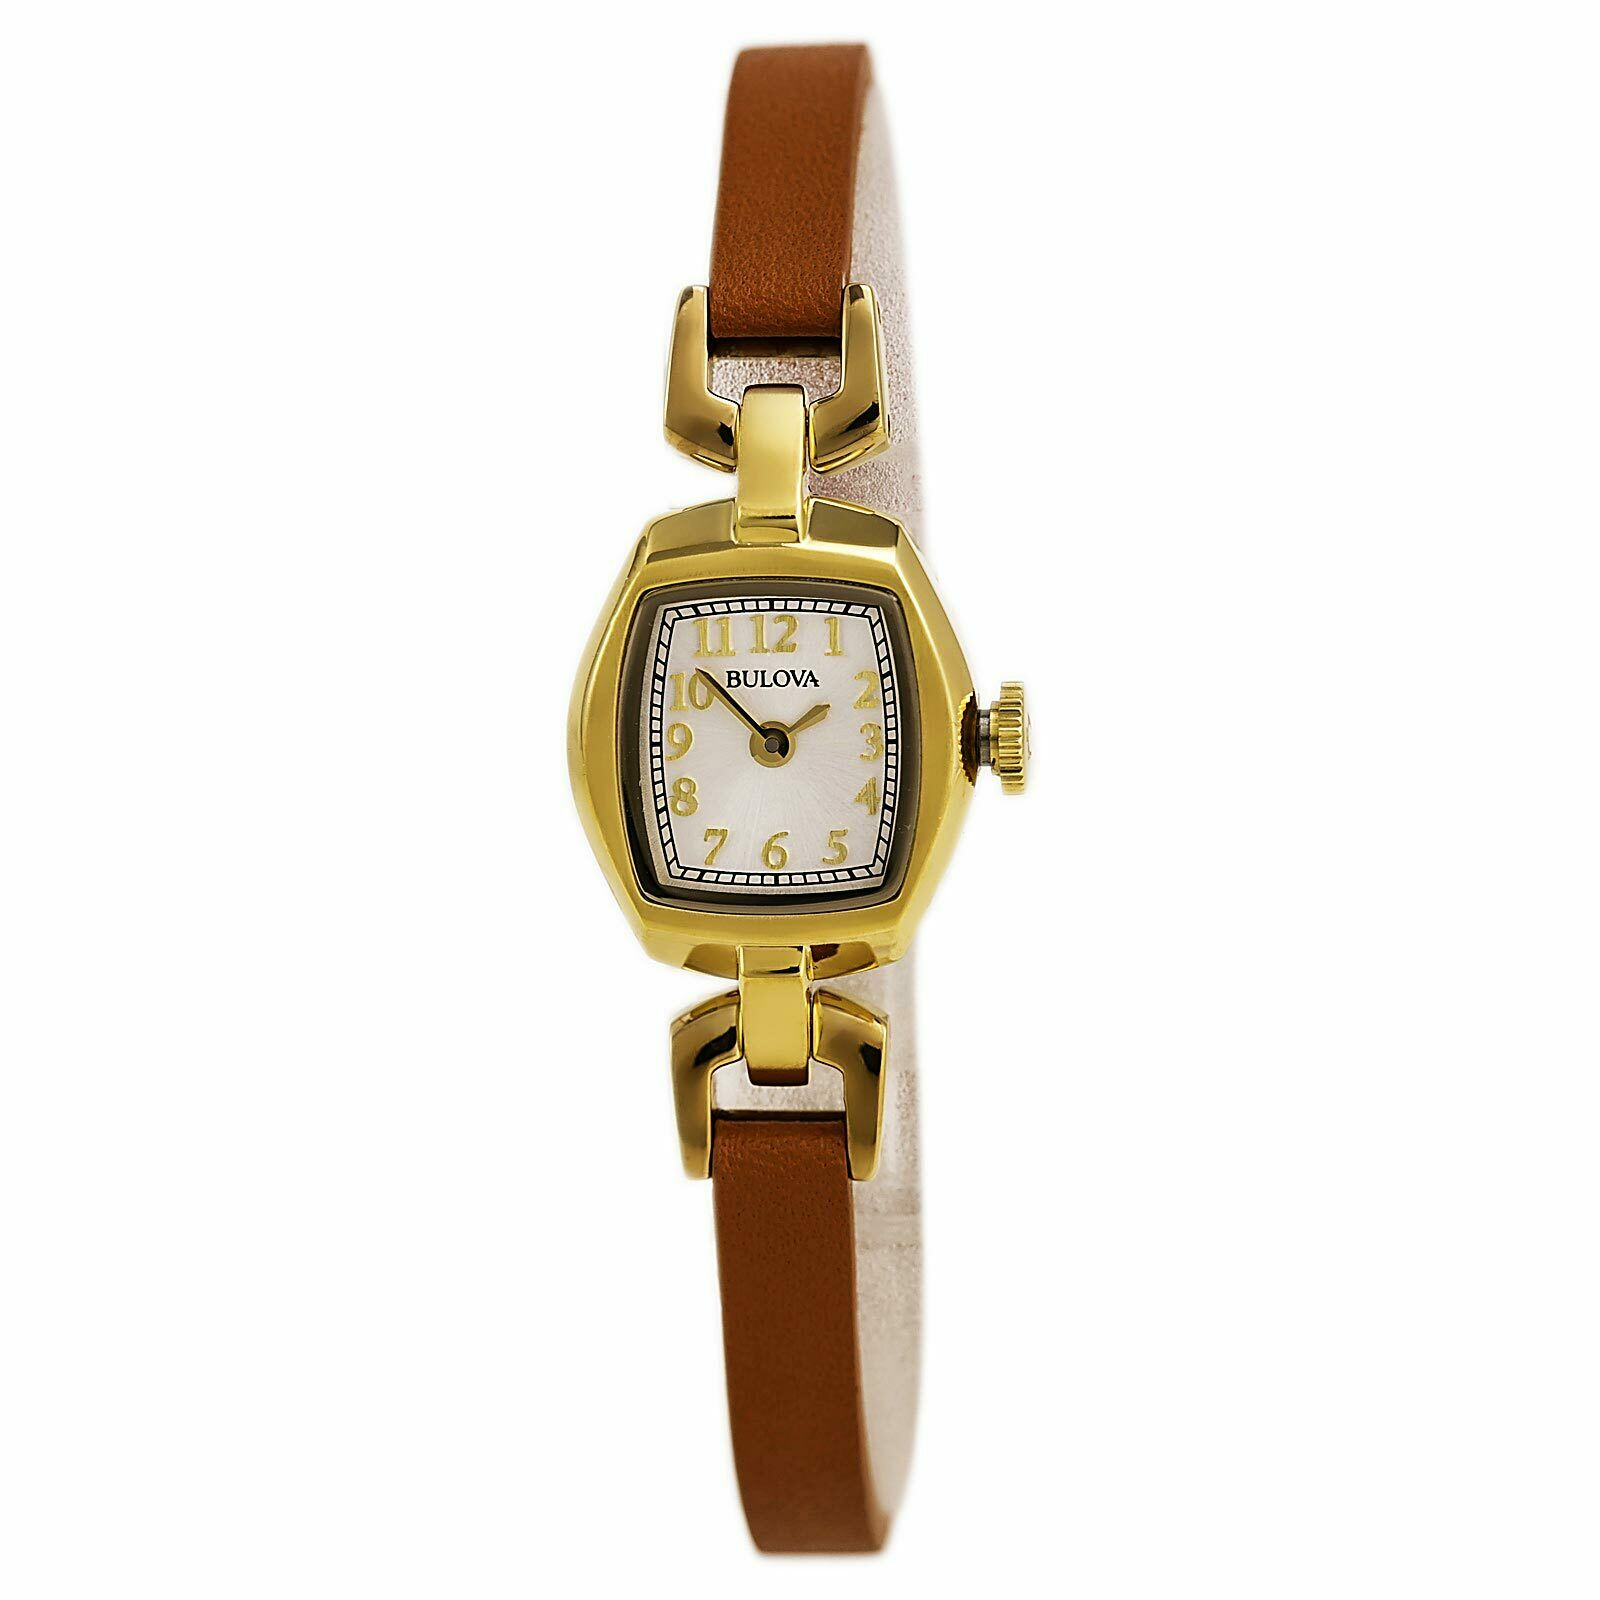 bulova-womens-quartz-brown-leather-band-tonneau-style-18mm-watch-97l153